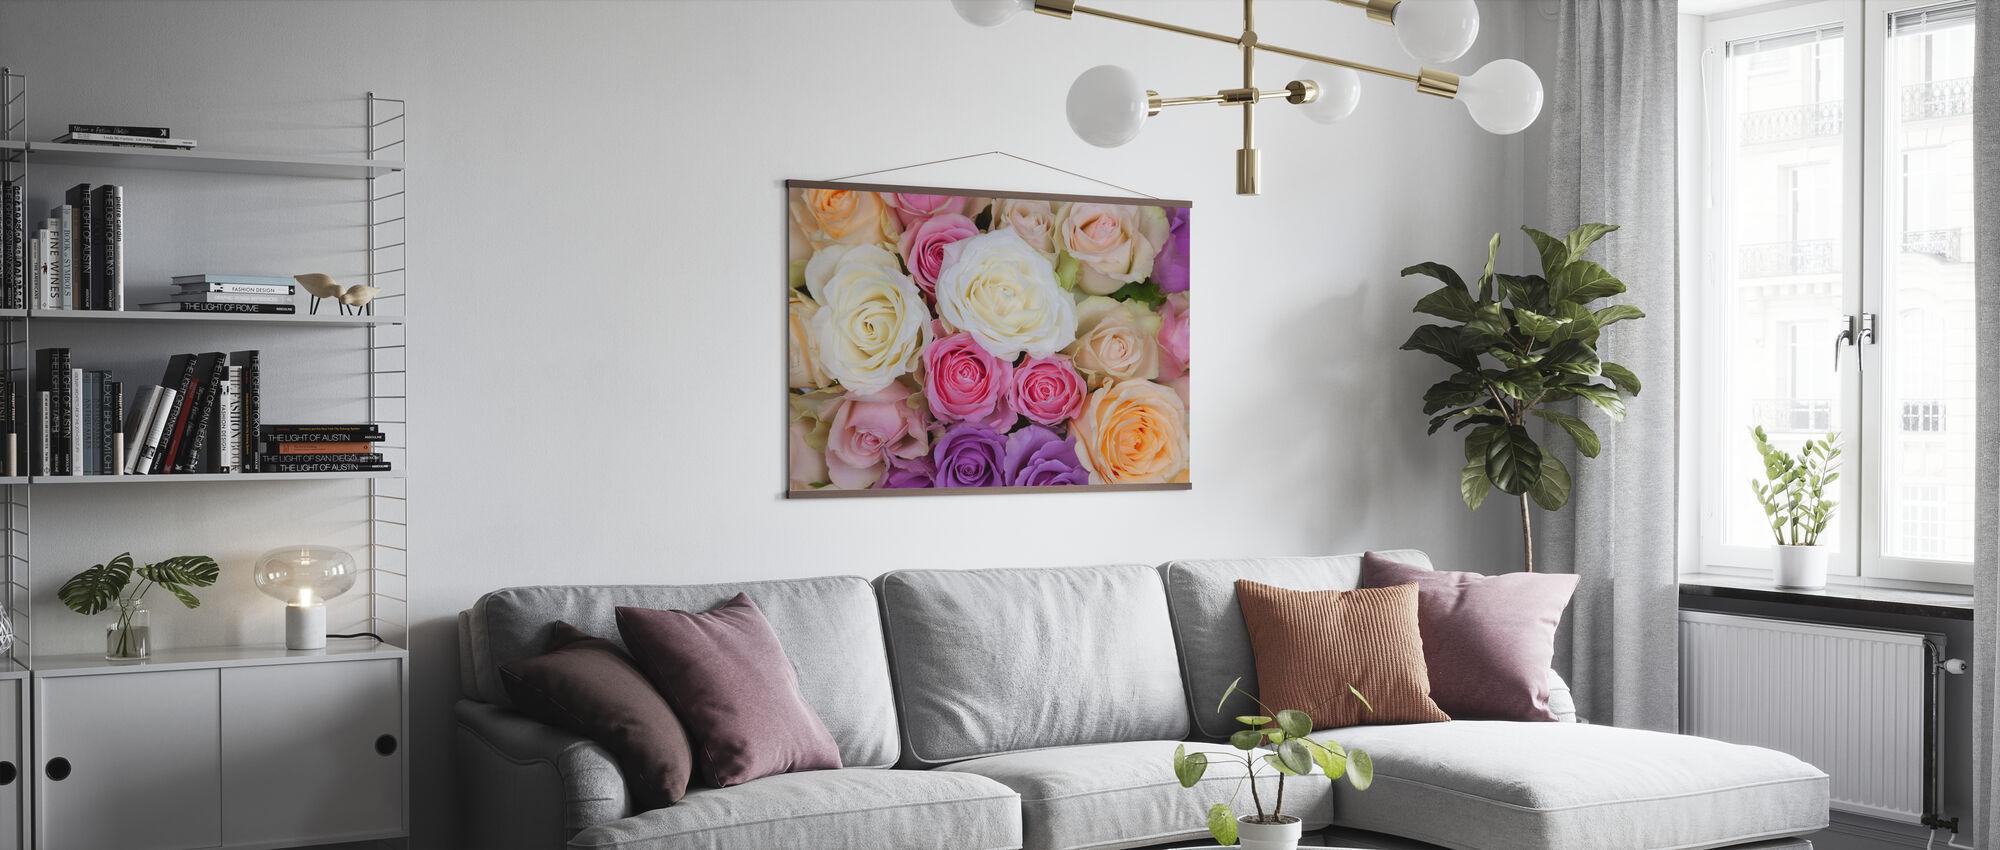 Färgglada rosor - Poster - Vardagsrum